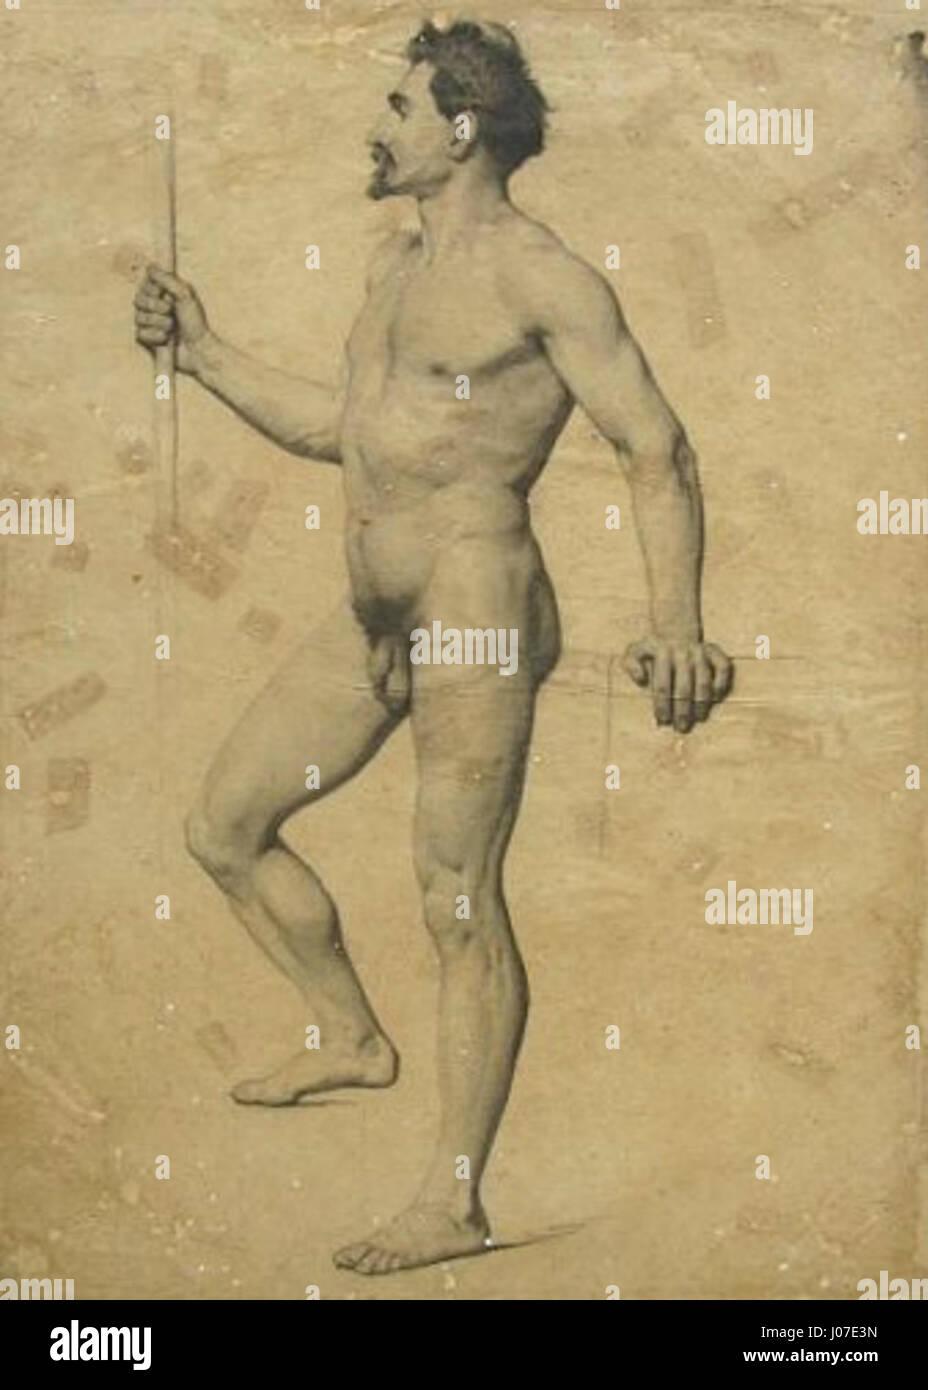 Victor Meirelles - Nu masculino de pé, em Peril (académico) Imagen De Stock